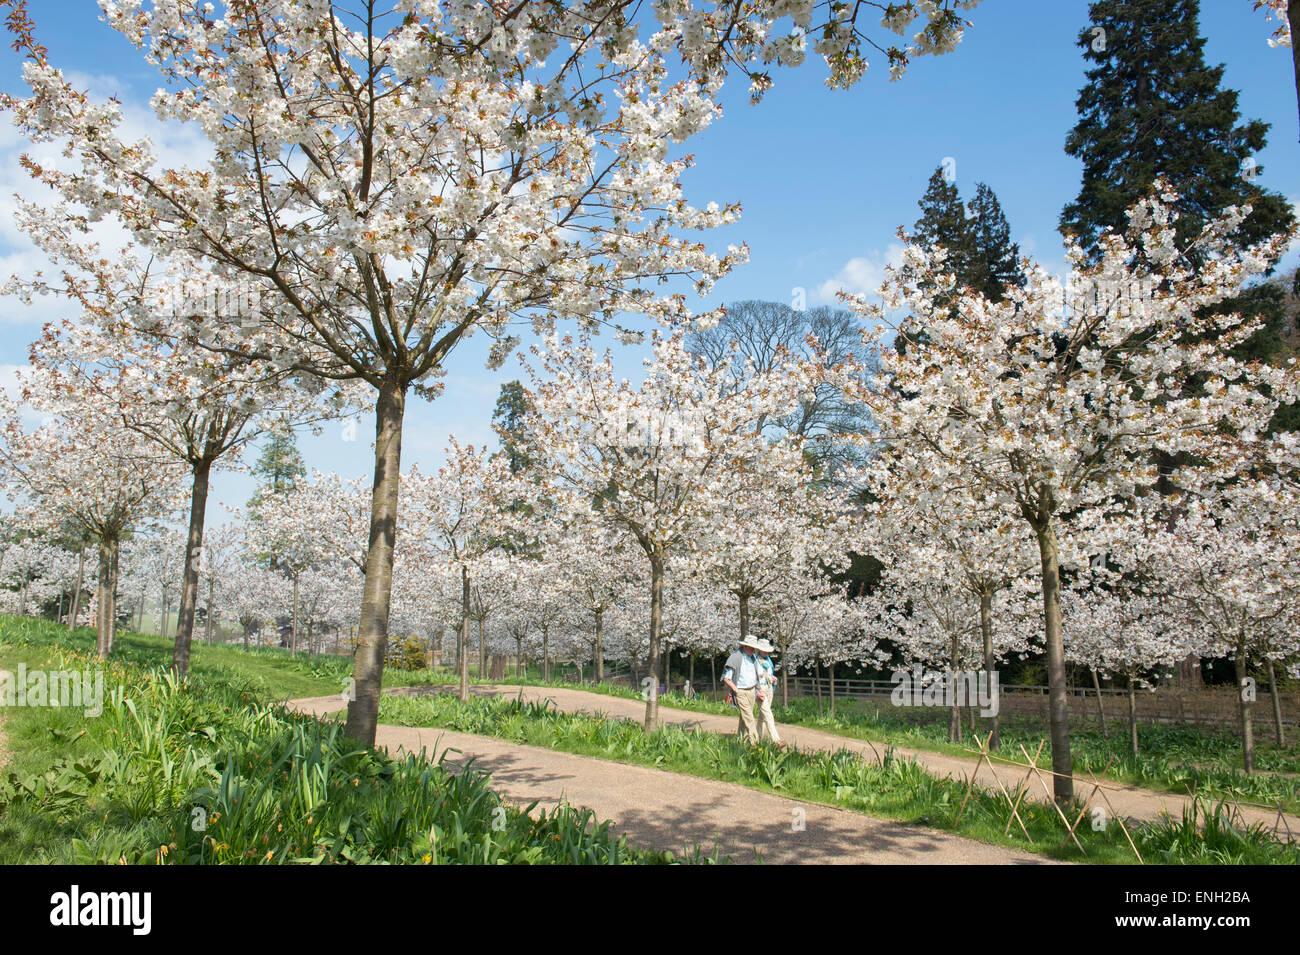 Prunus serrulata Tai Haku. Great white cherry tree orchard at Alnwick Gardens, Northumberland, England - Stock Image